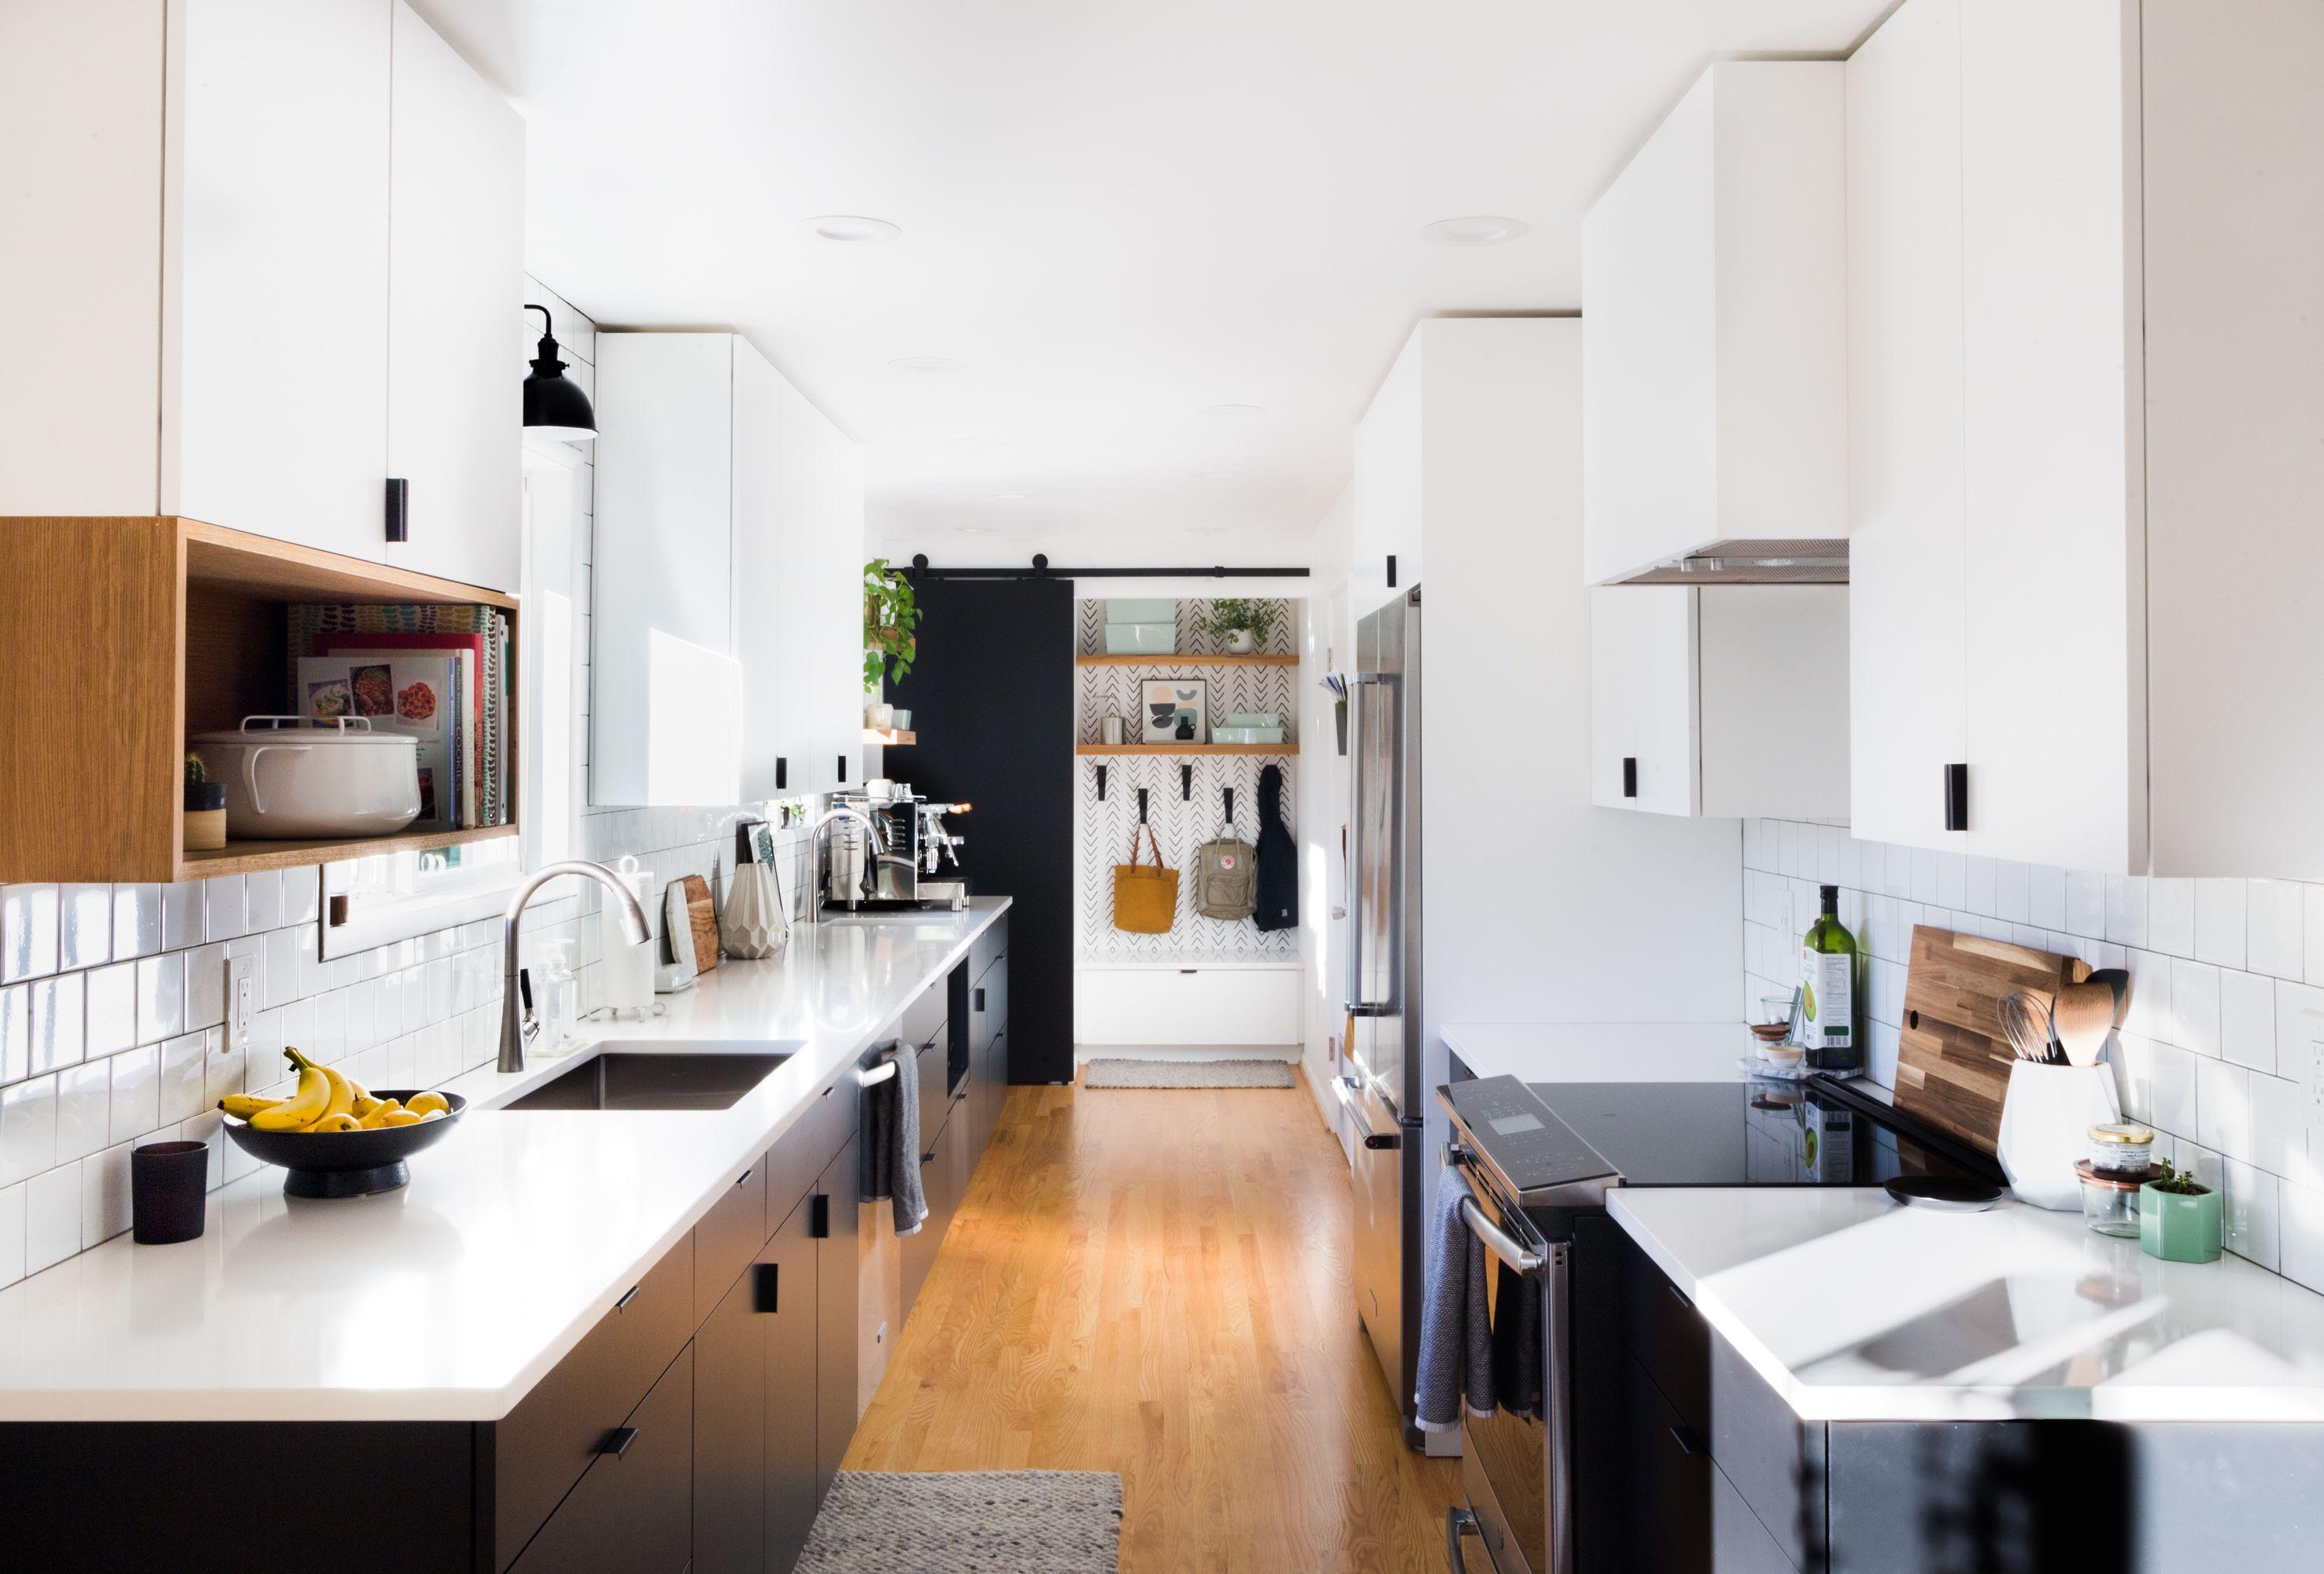 A Recent Kitchen Remodel In Beaverton Oregon Remodel Remodelingkitchenideas Remodelingideas Remode Kitchen Remodel Home Remodeling Straight Line Designs